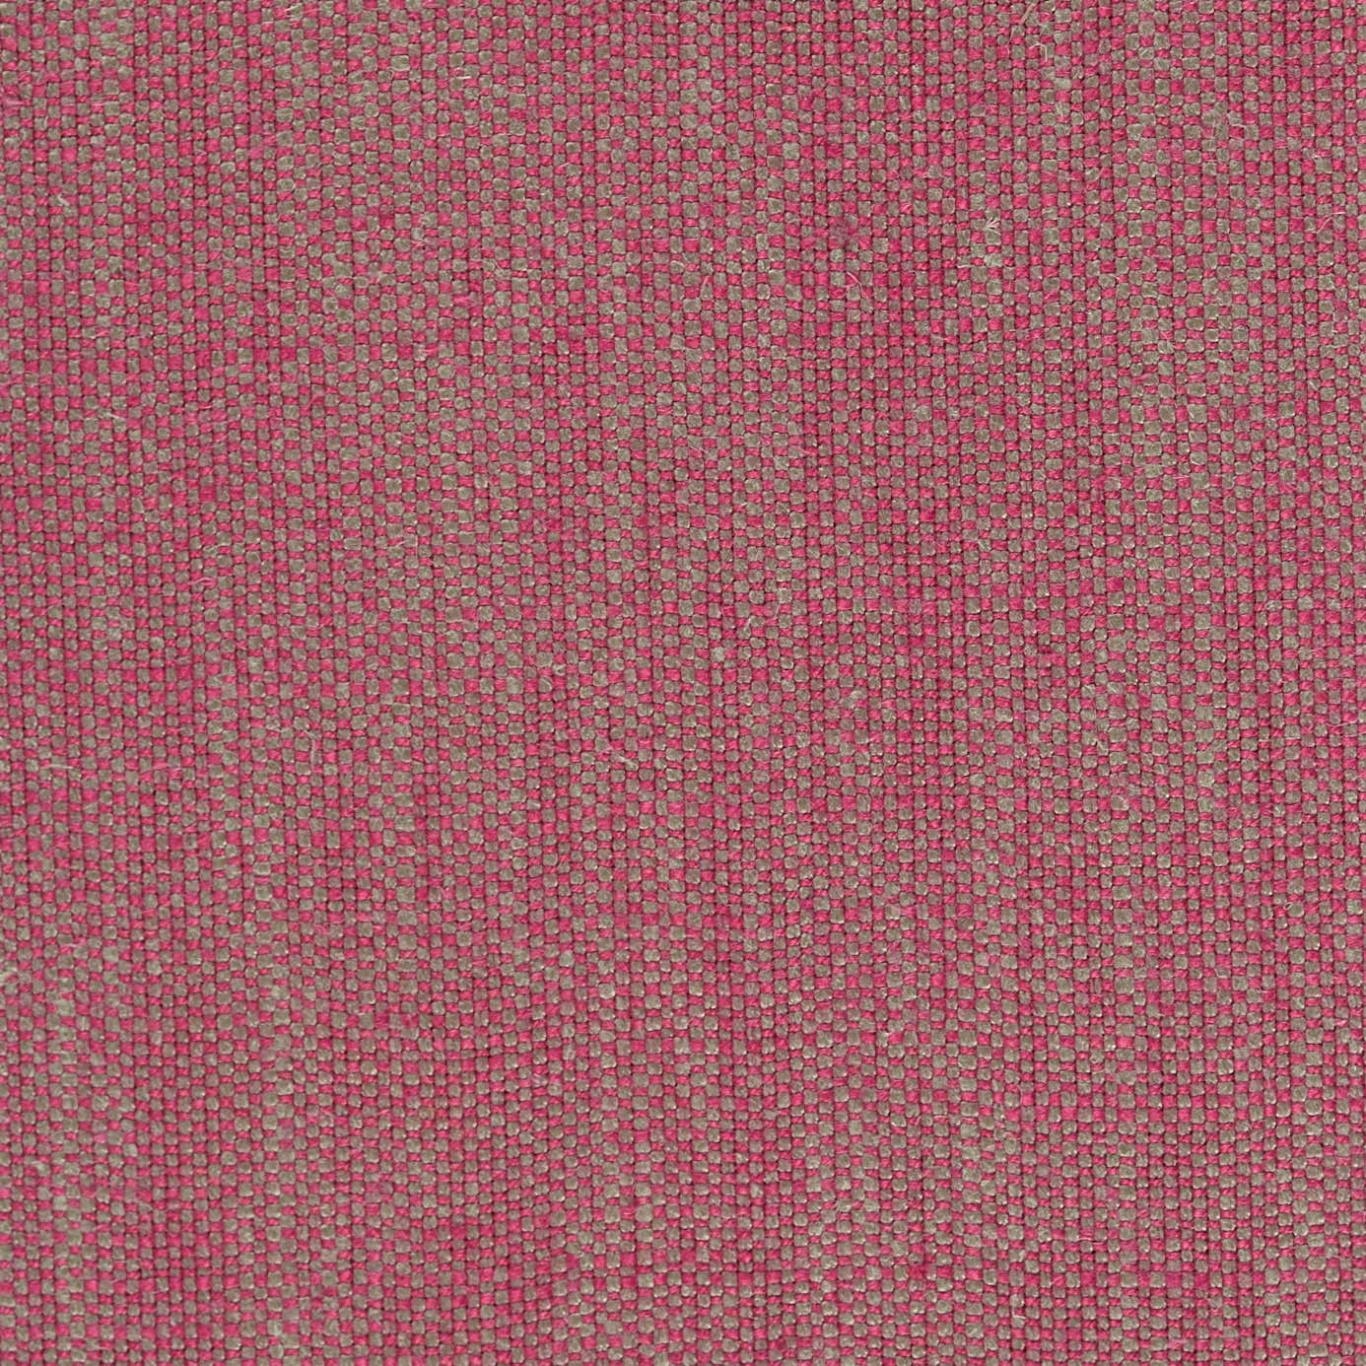 Image of Harlequin Atom Punch Fabric 440160